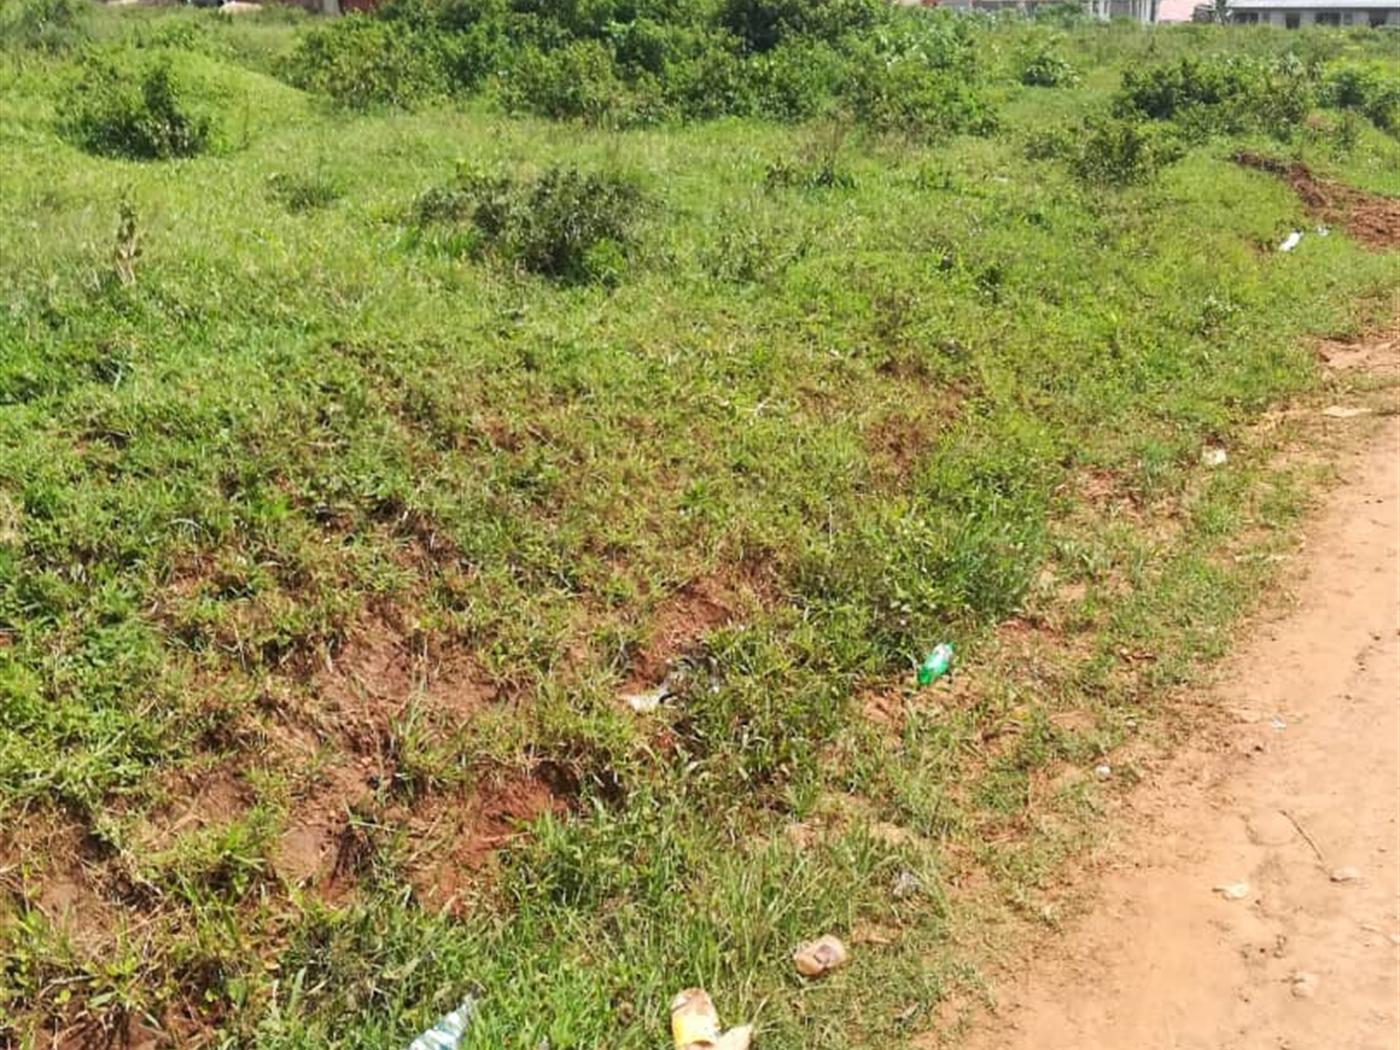 Residential Land for sale in Kilowoza Mukono